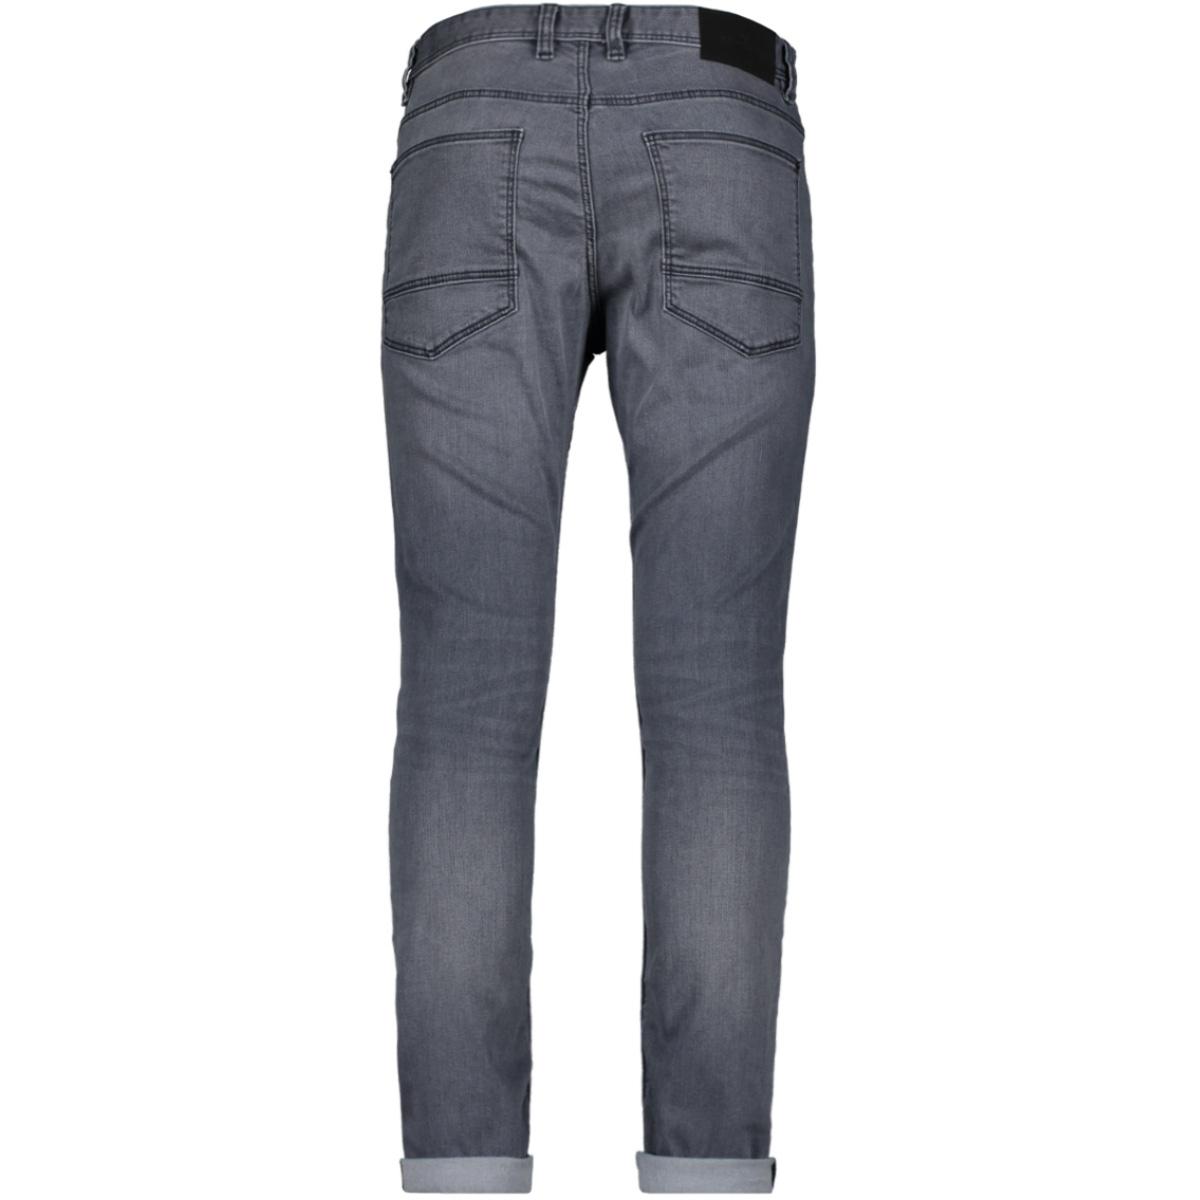 jeans josh regular slim 1012994xx10 tom tailor jeans 10210